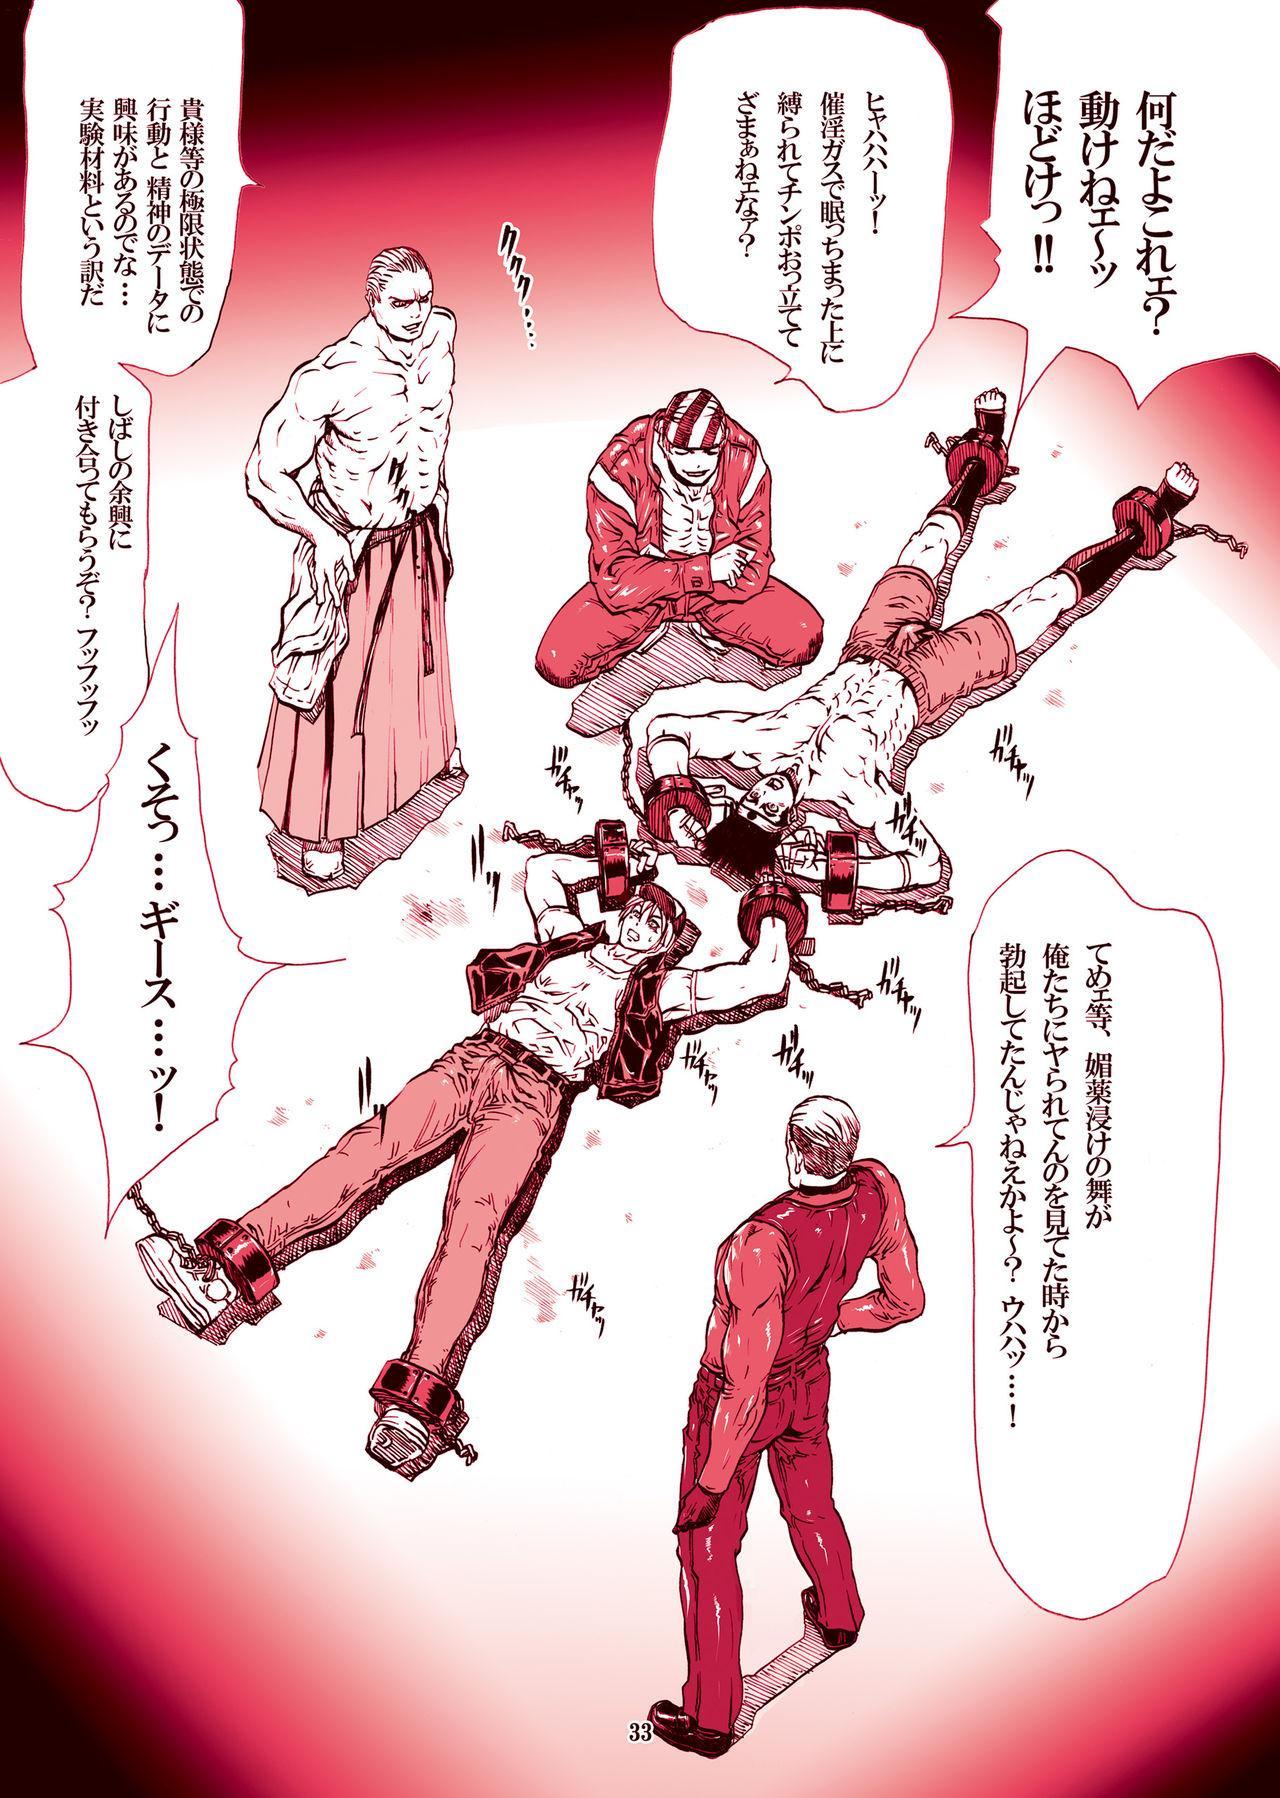 [LINDA]「舞ing(まいっちんぐ)完全版」サンプル●不知火舞 30